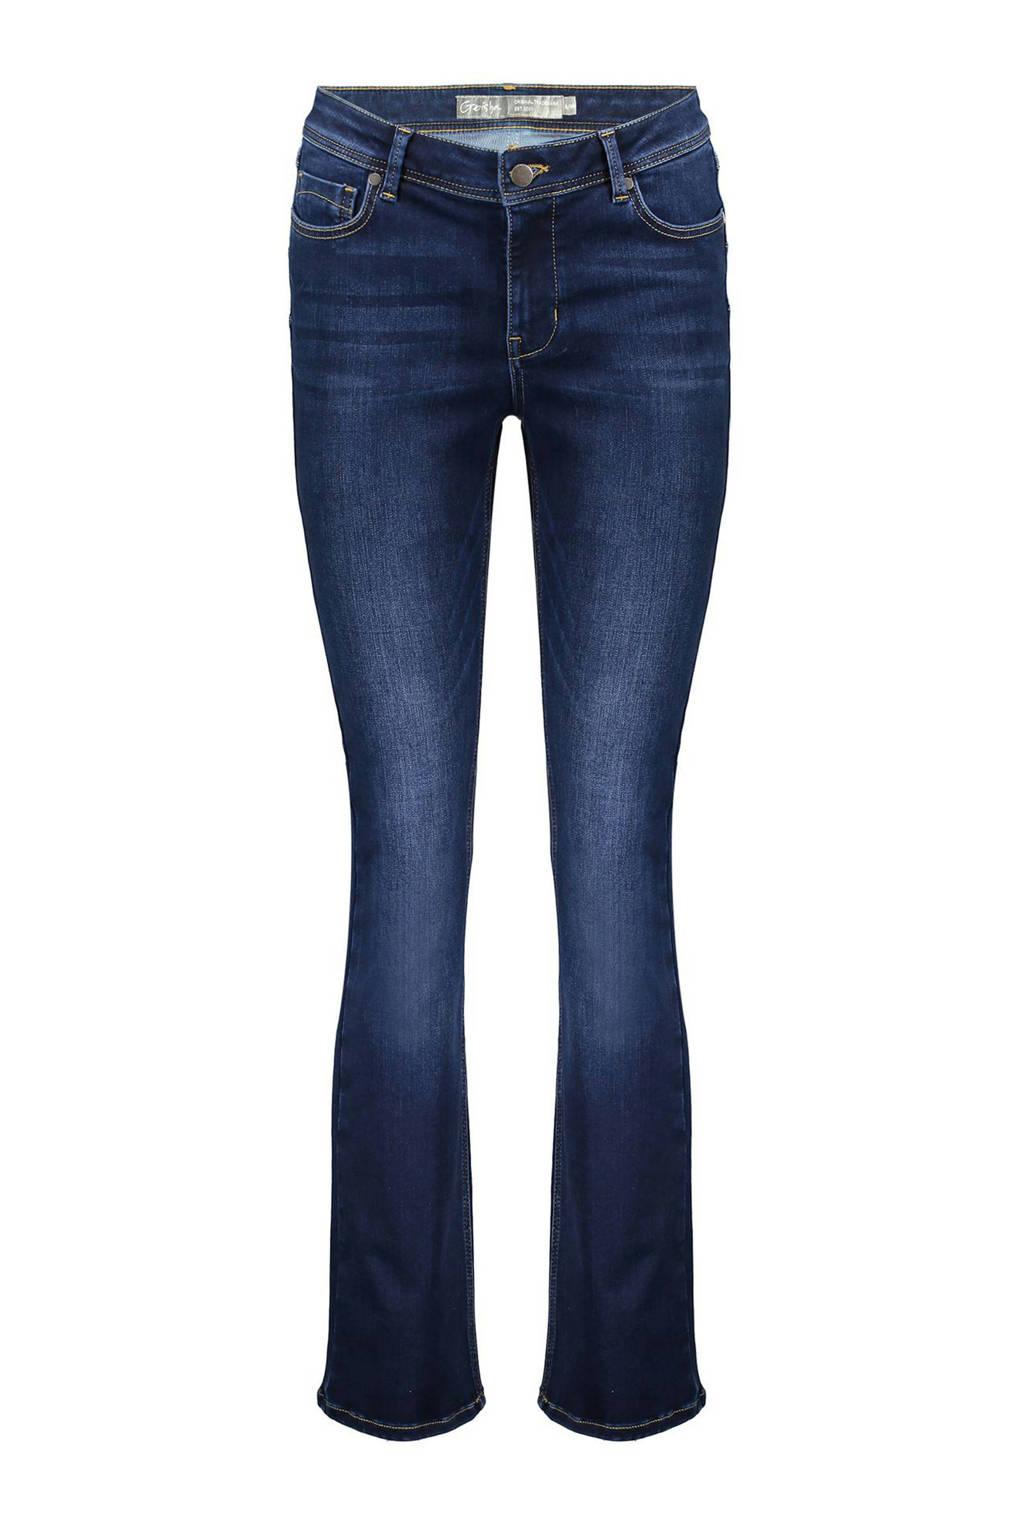 Geisha flared jeans donkerblauw, Donkerblauw